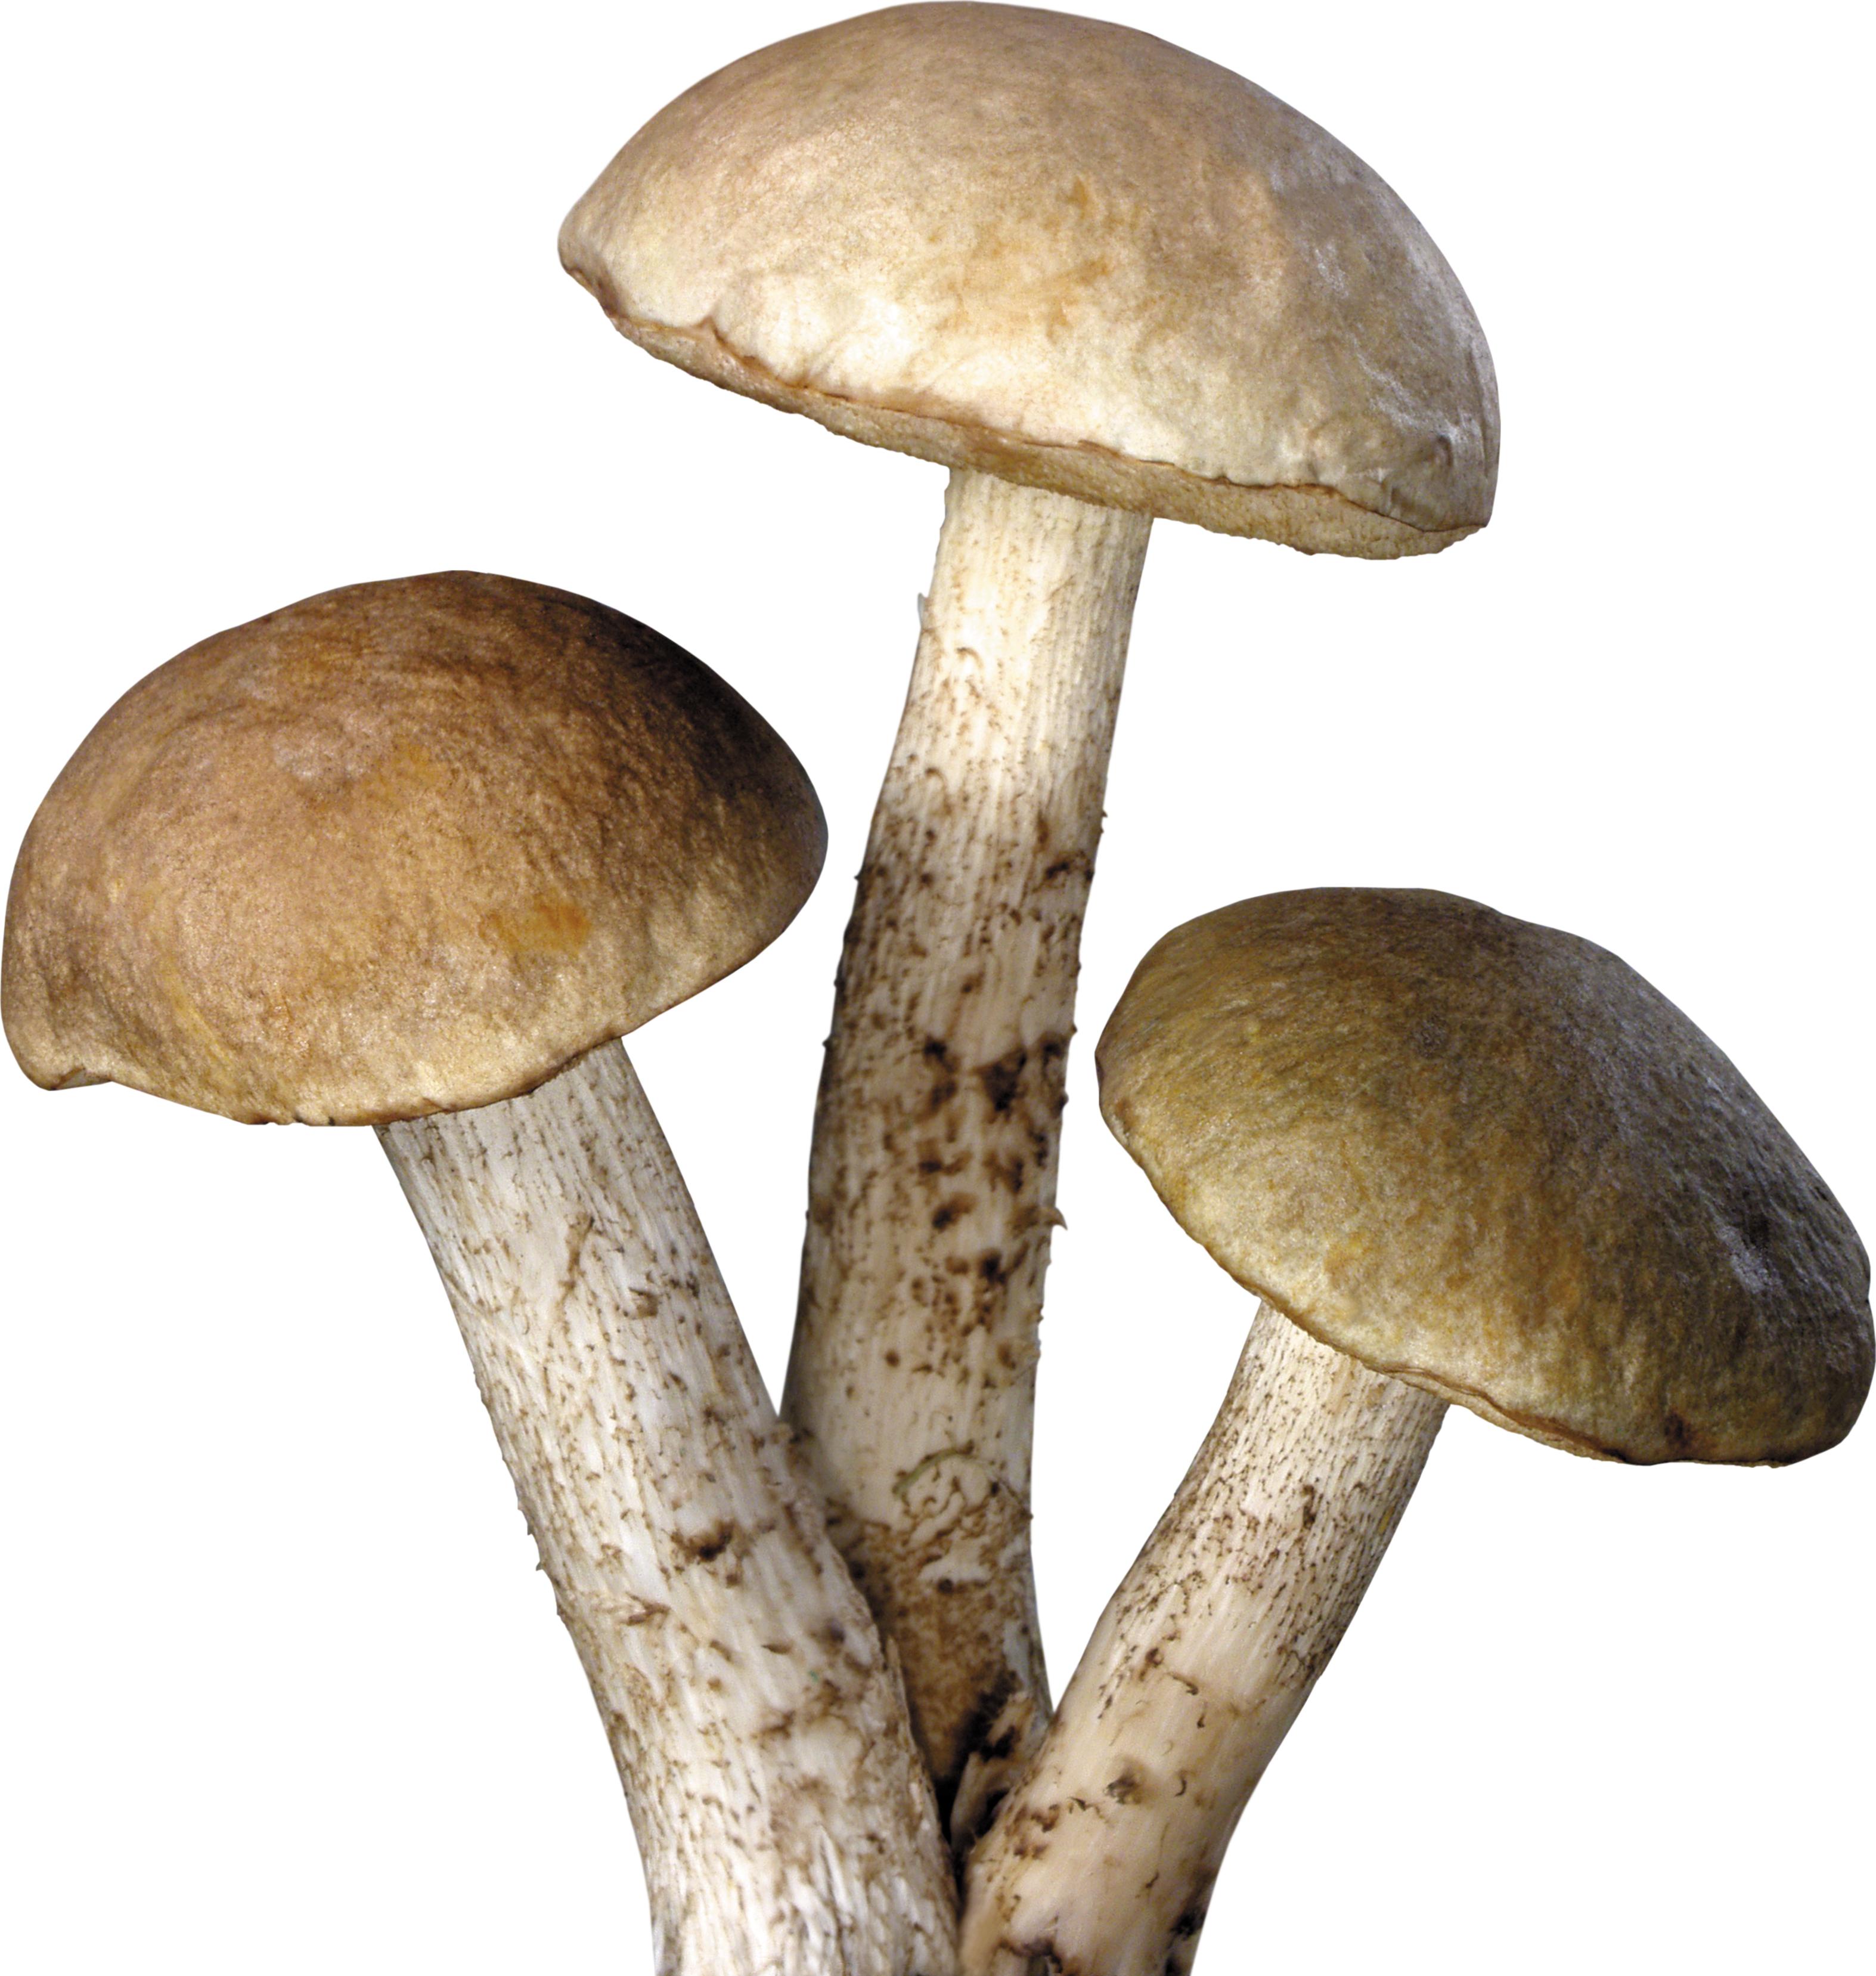 Mushroom PNG Transparent